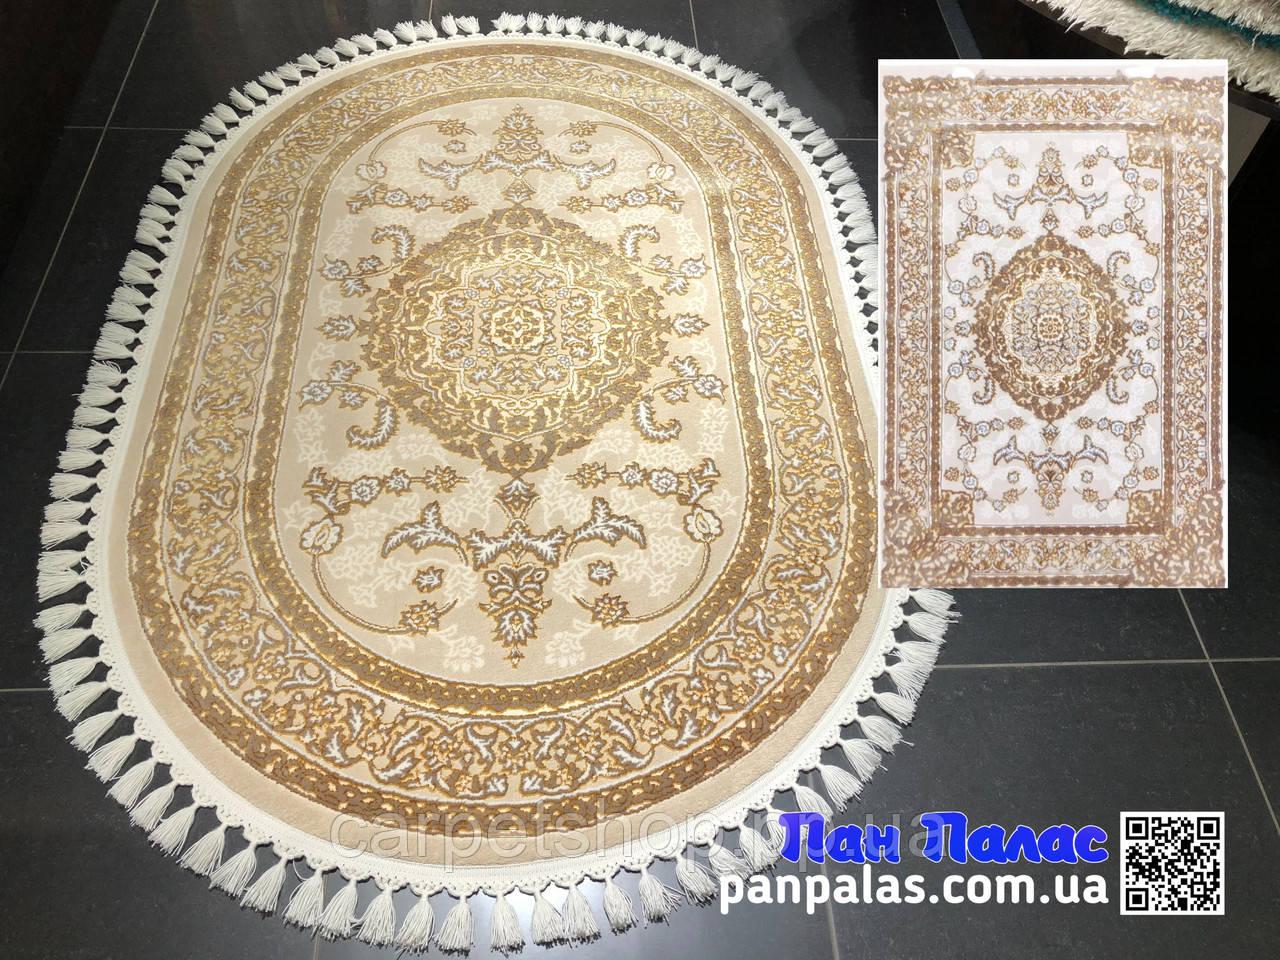 60х110 Ковёр Praga Art Carpet 138 beg. Овал, прямой.